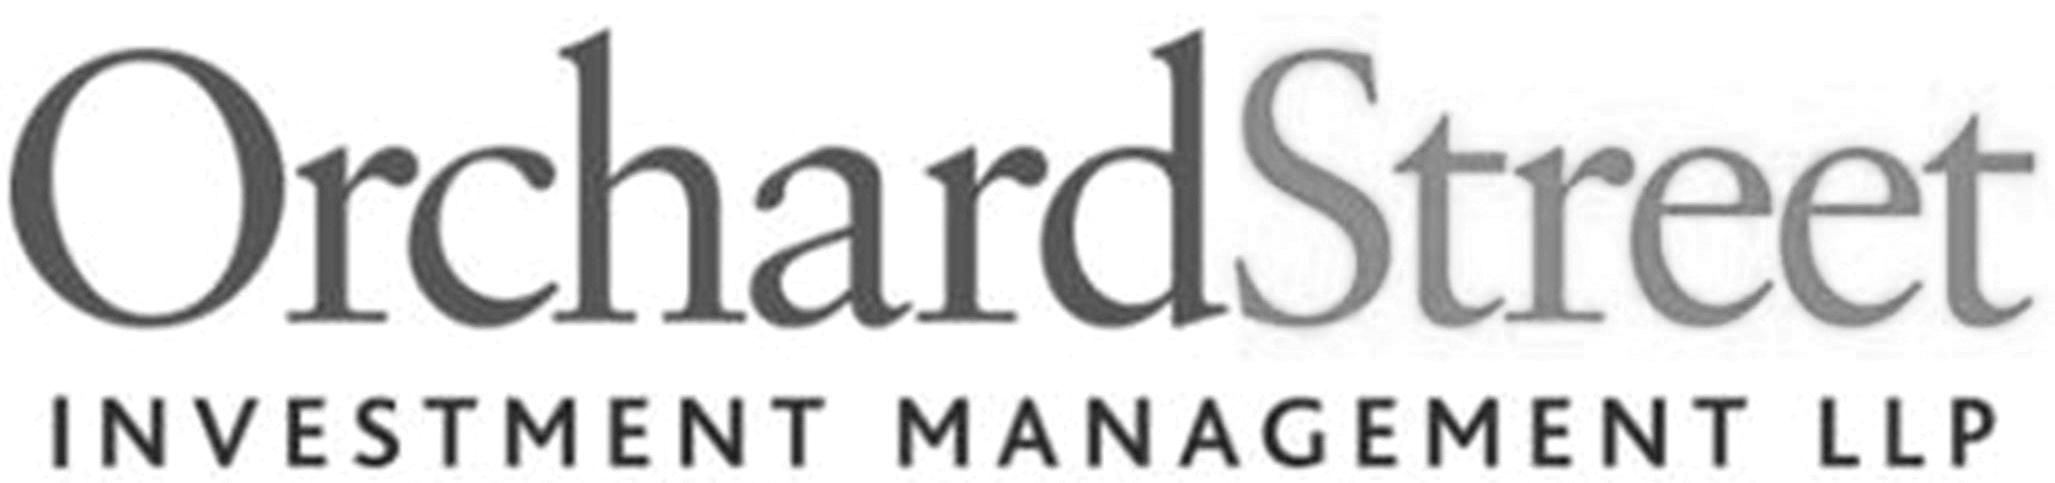 orchard street logo